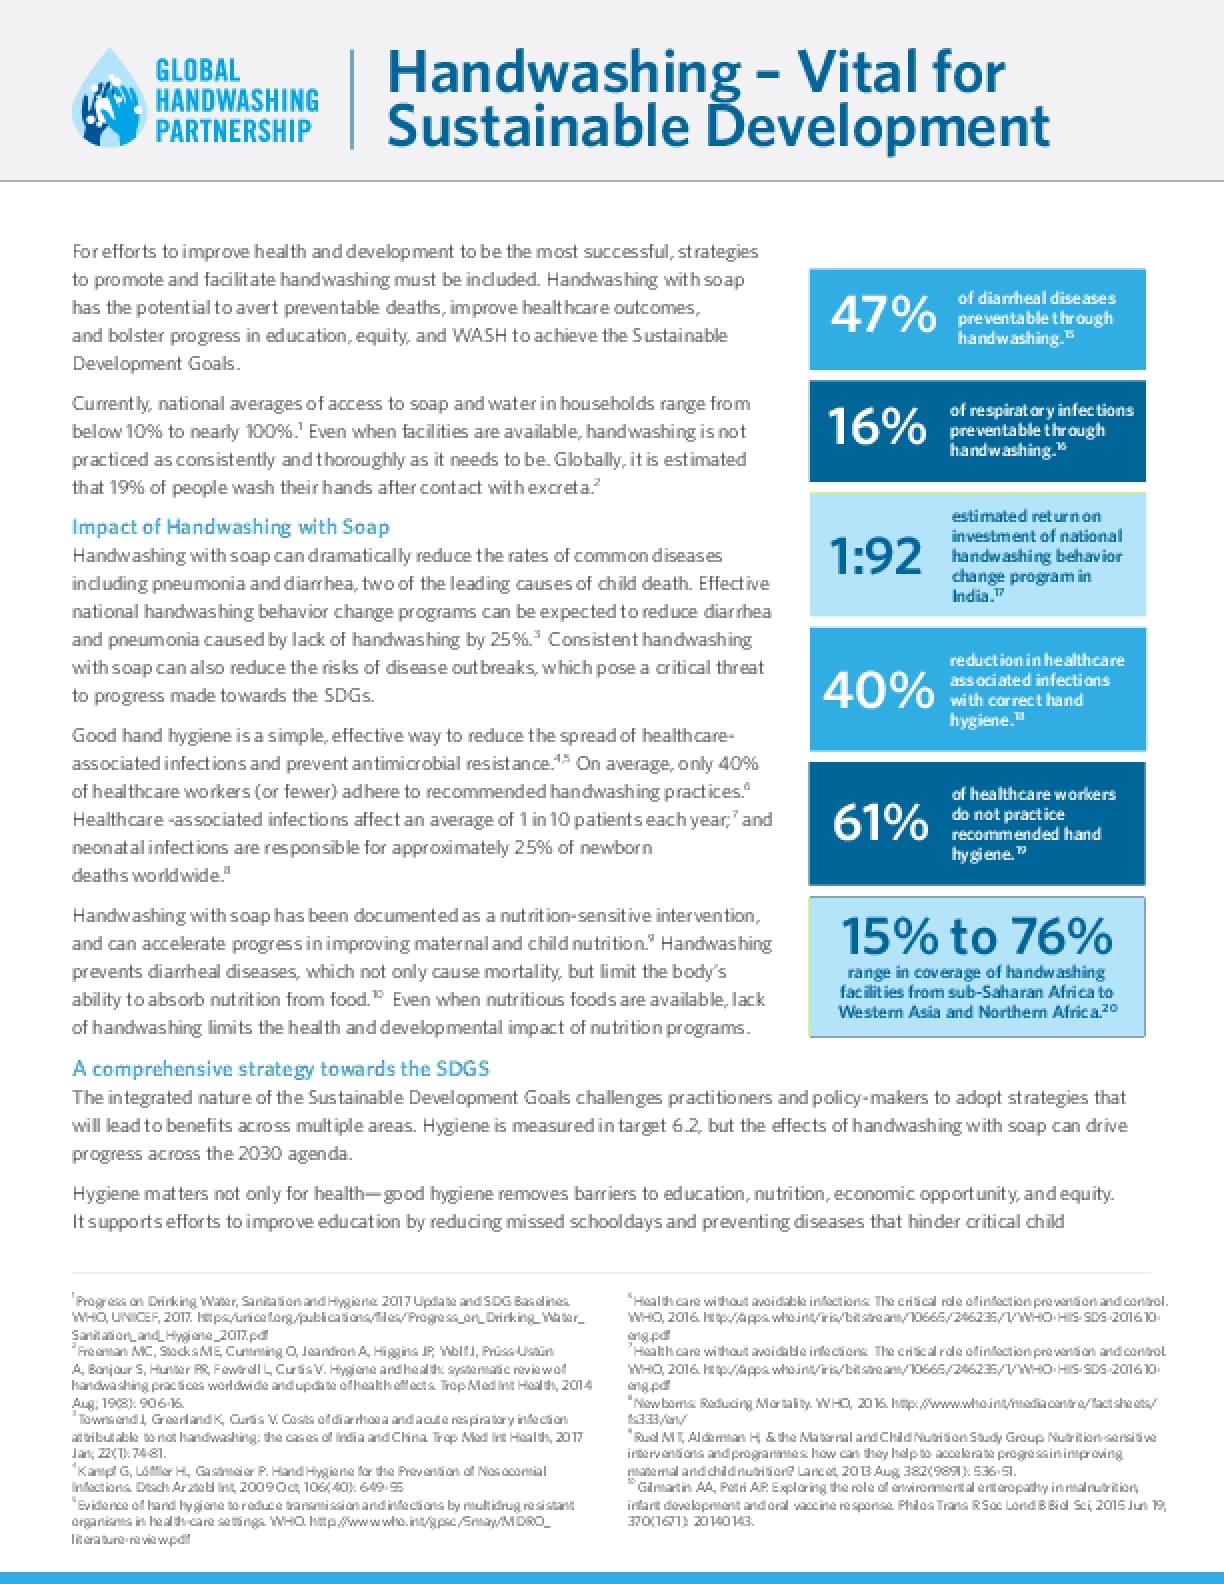 Handwashing – Vital for Sustainable Development advocacy brief